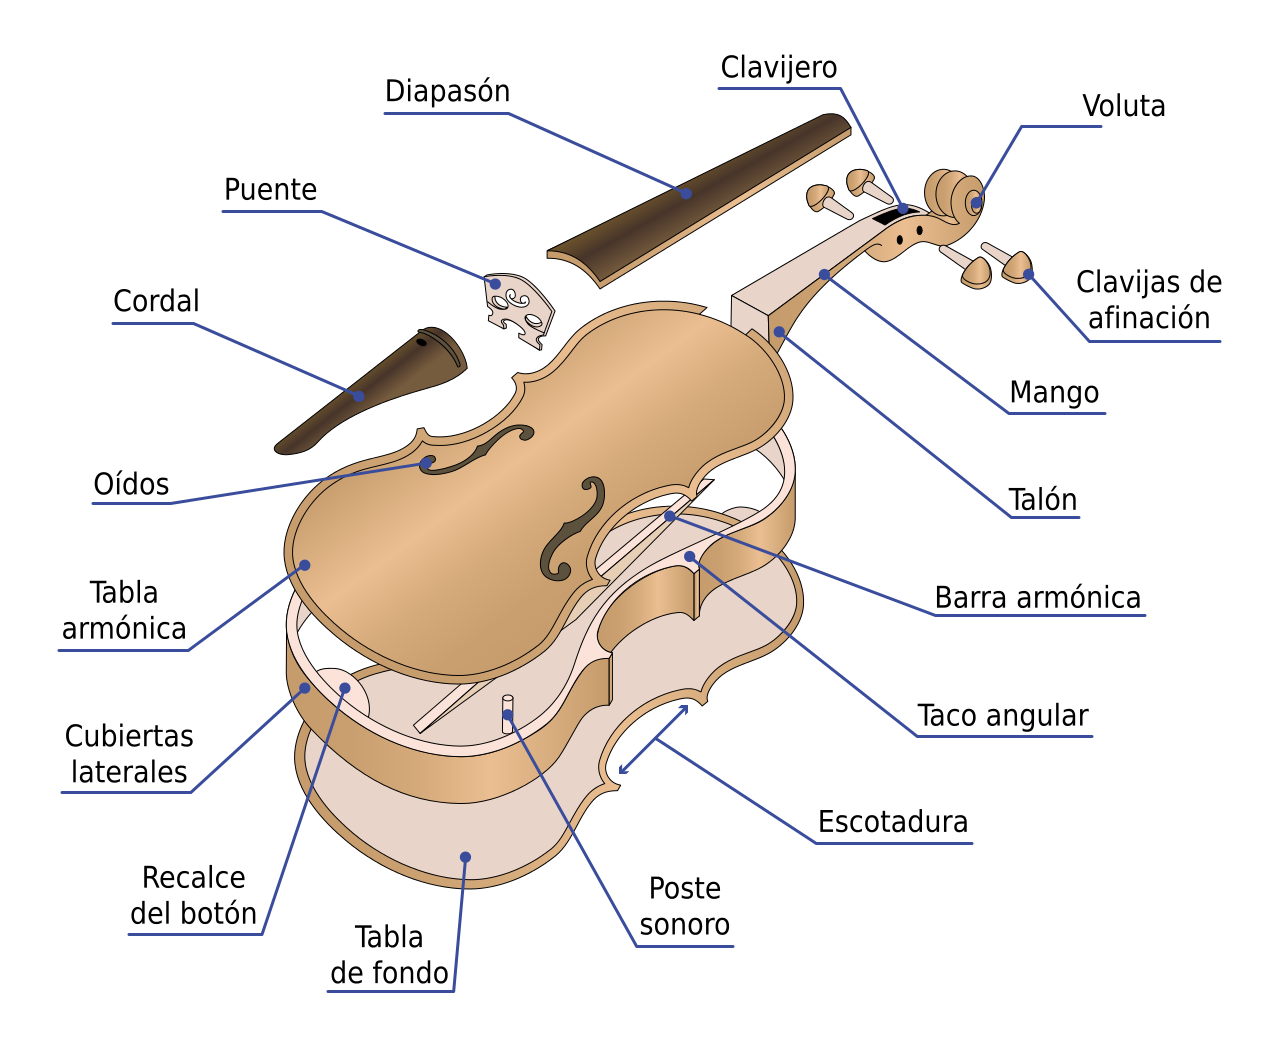 Partes Del Vioin Violines Clases De Violin Fotografia De Violin